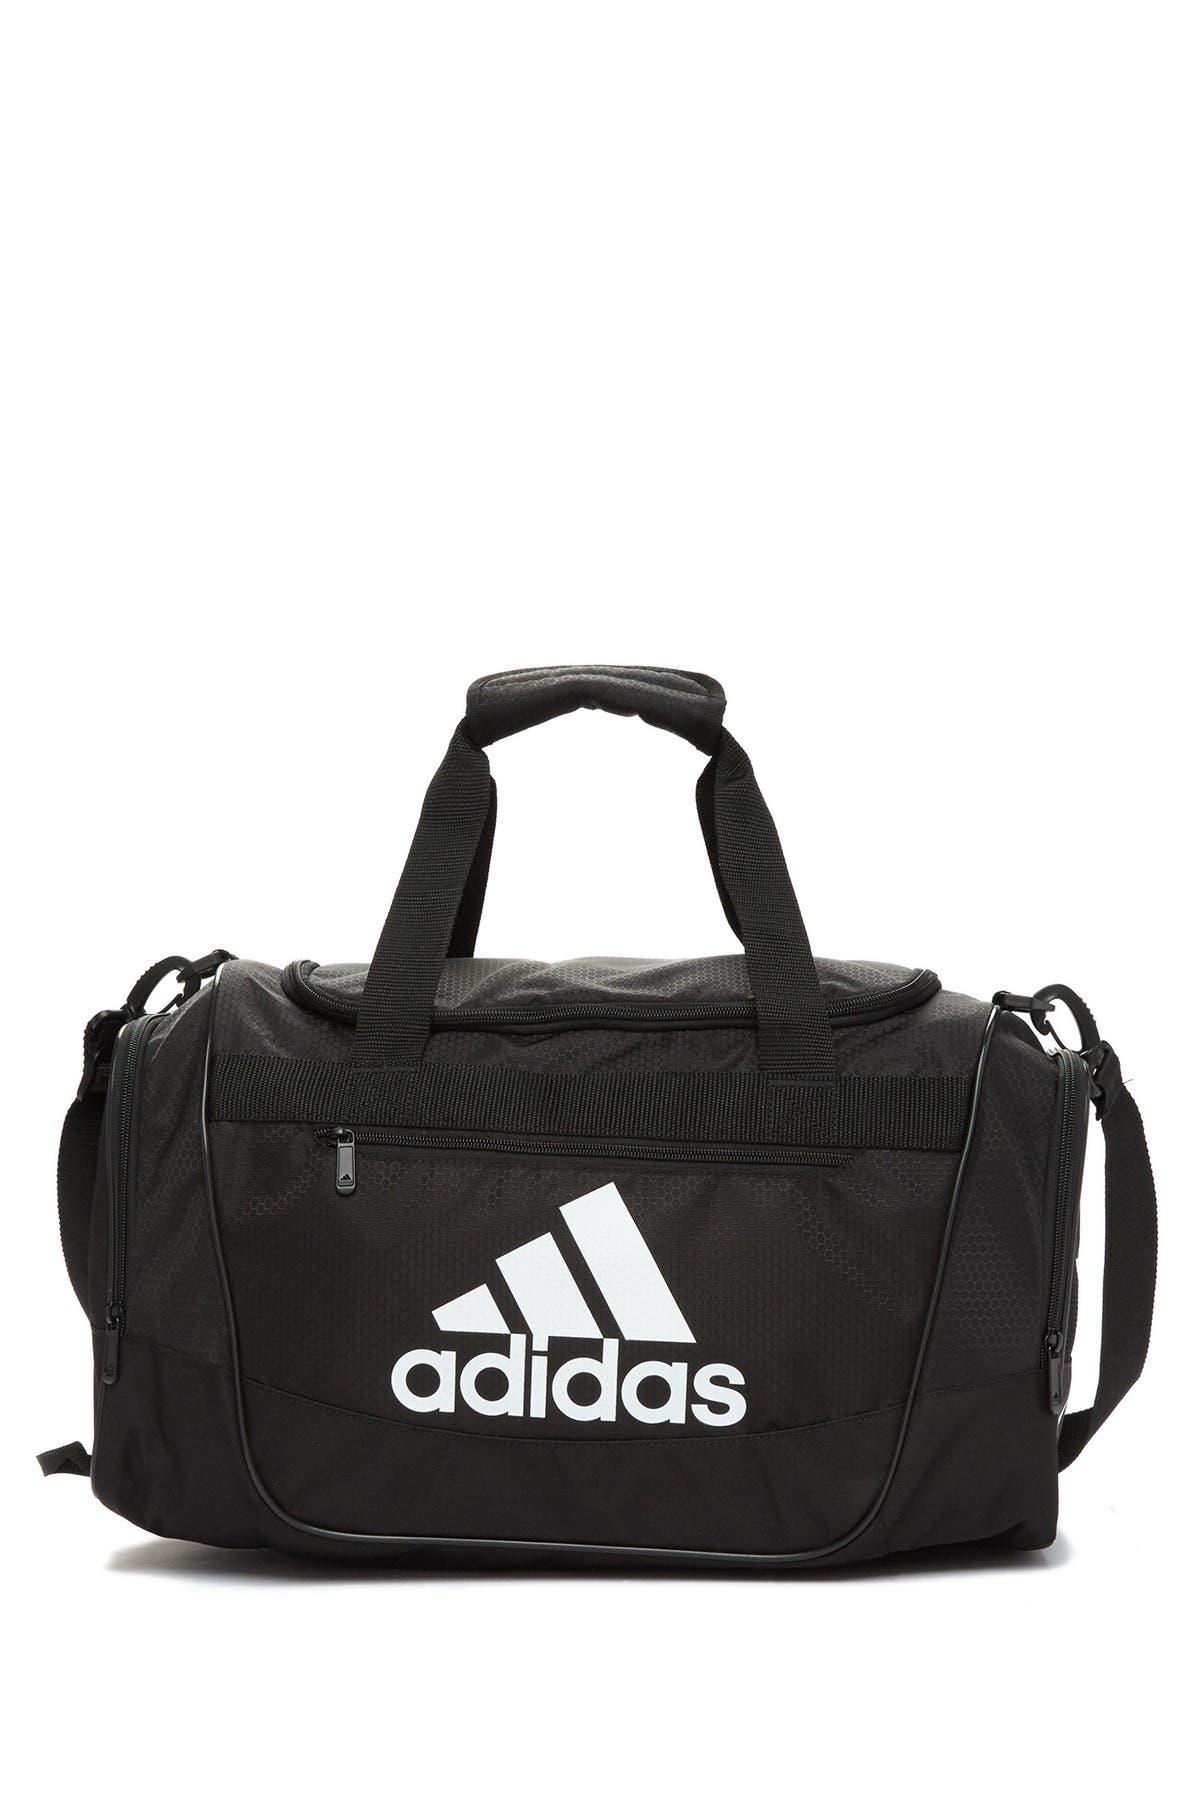 Image of adidas Defender III Small Duffel Bag